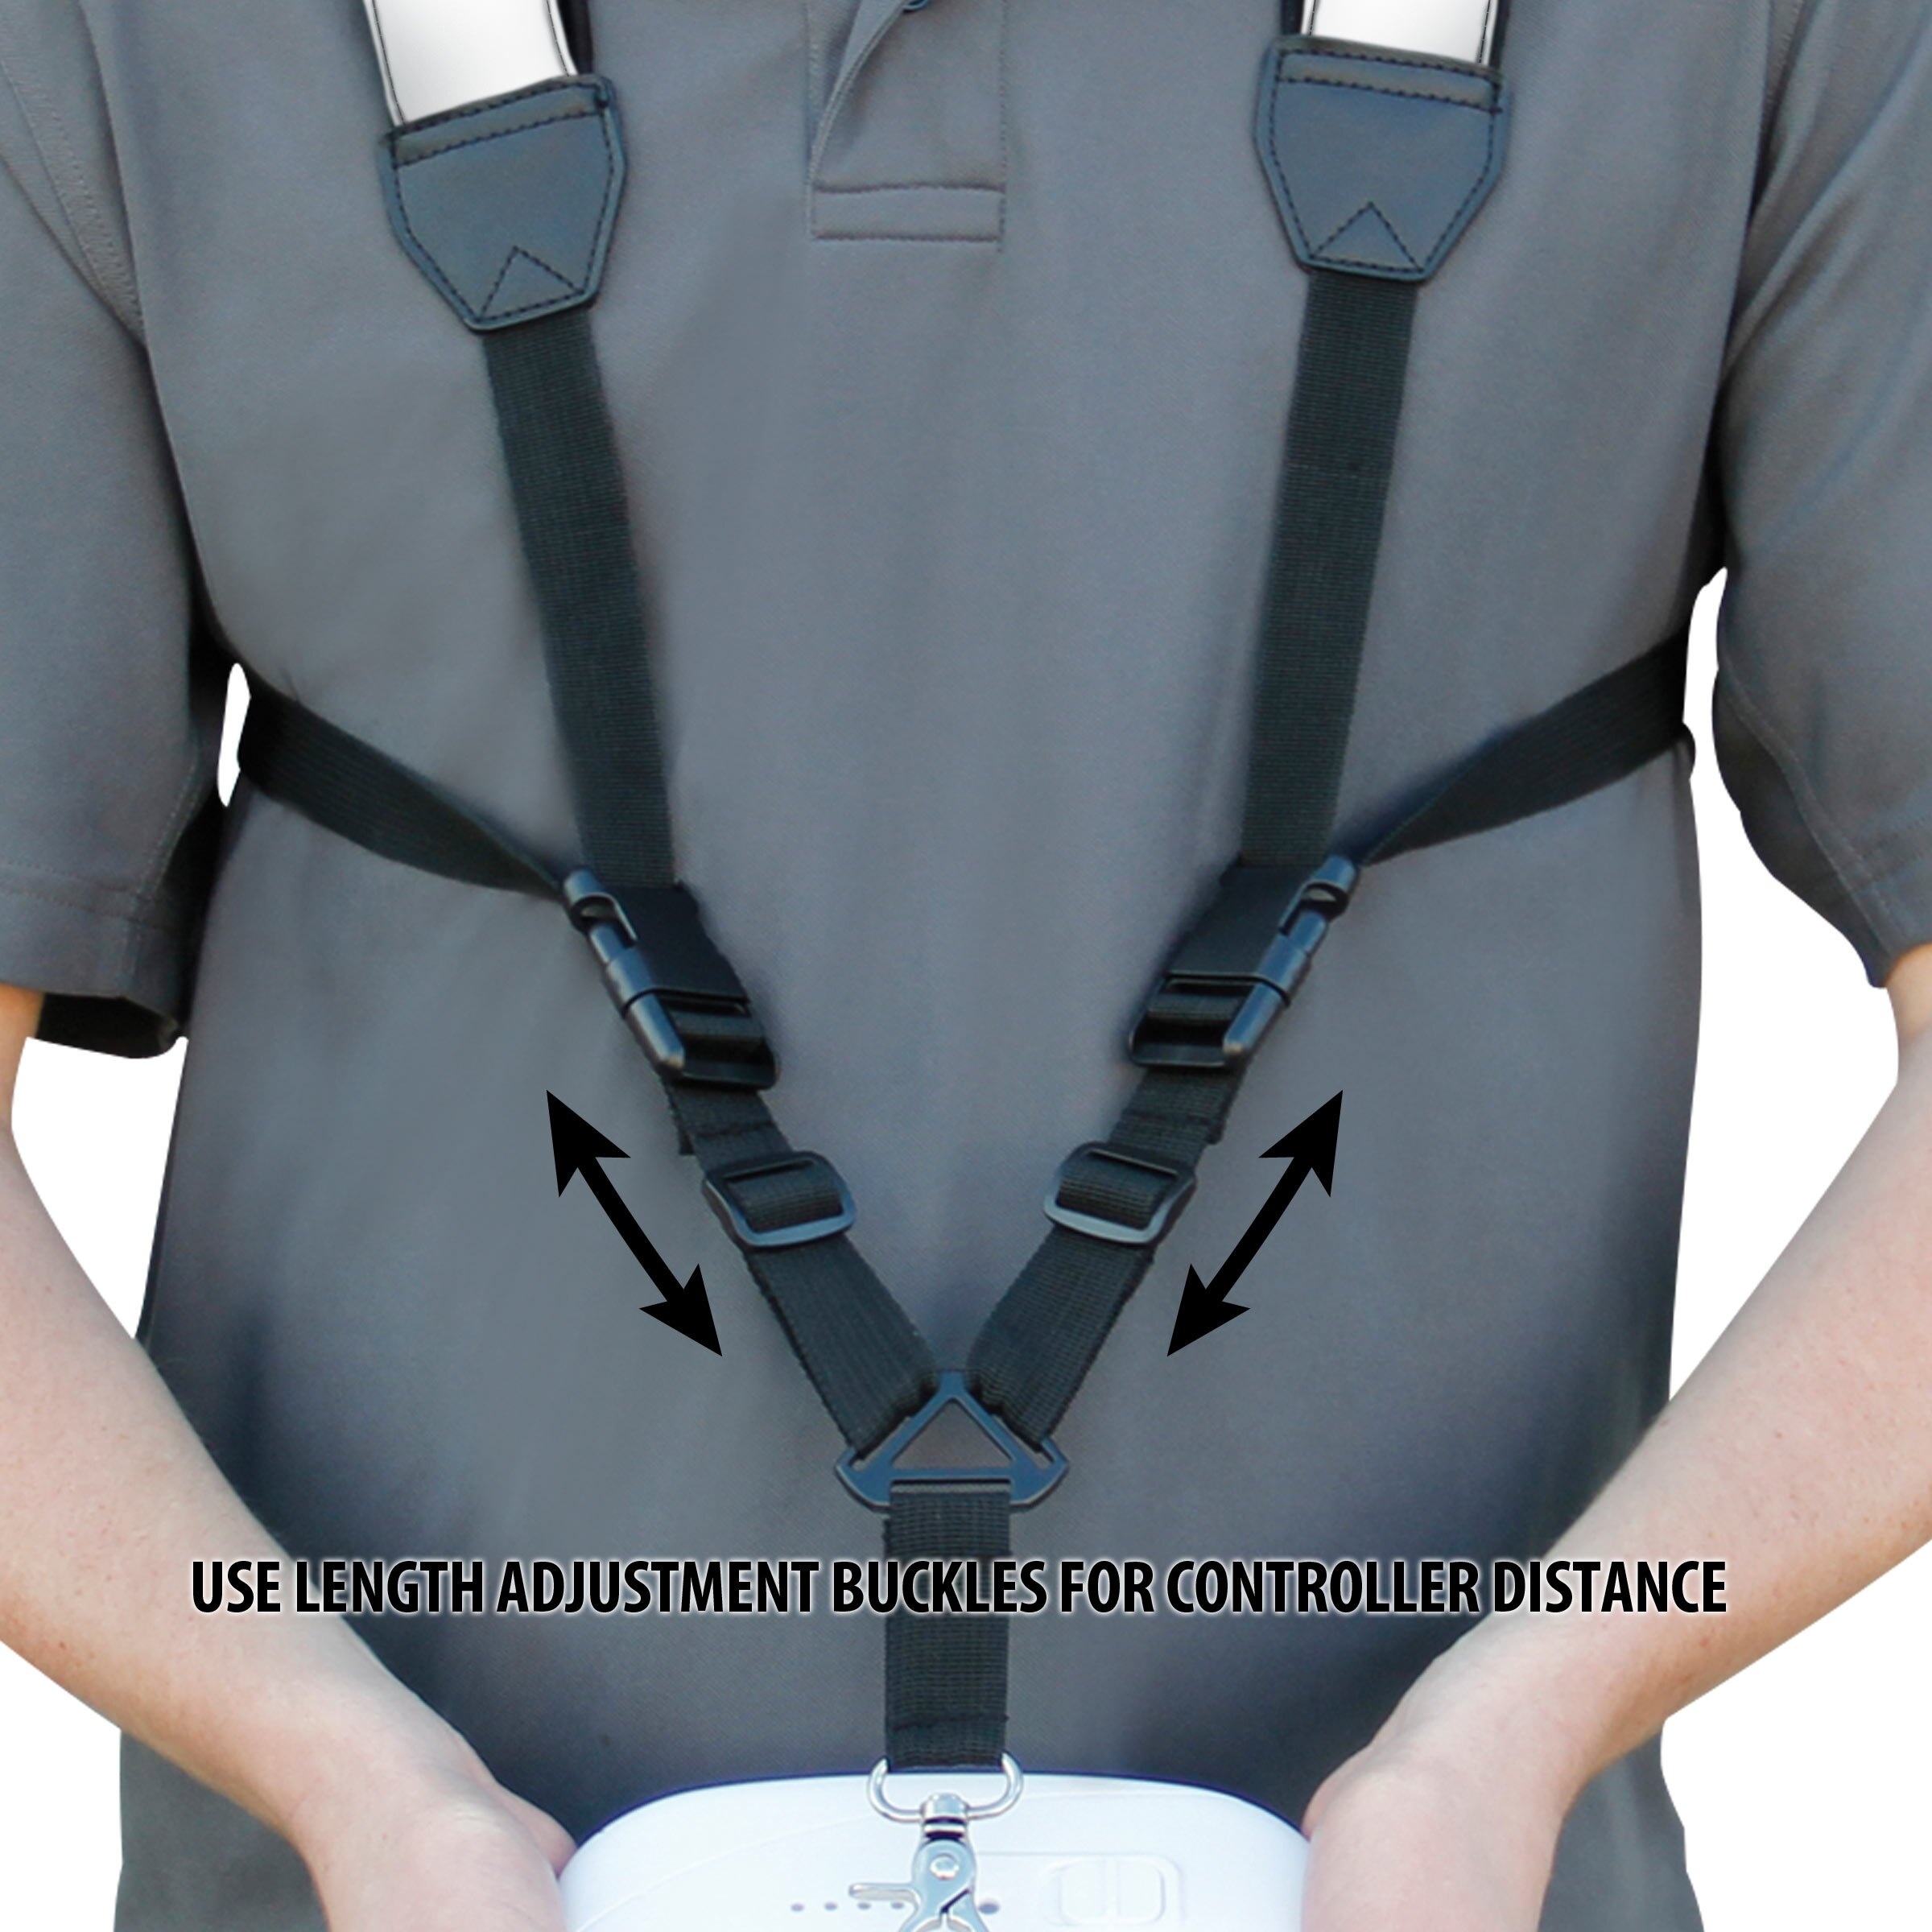 USA Gear Remote Control Drone Harness Strap with Neoprene Design and Accessory Storage Pockets 2